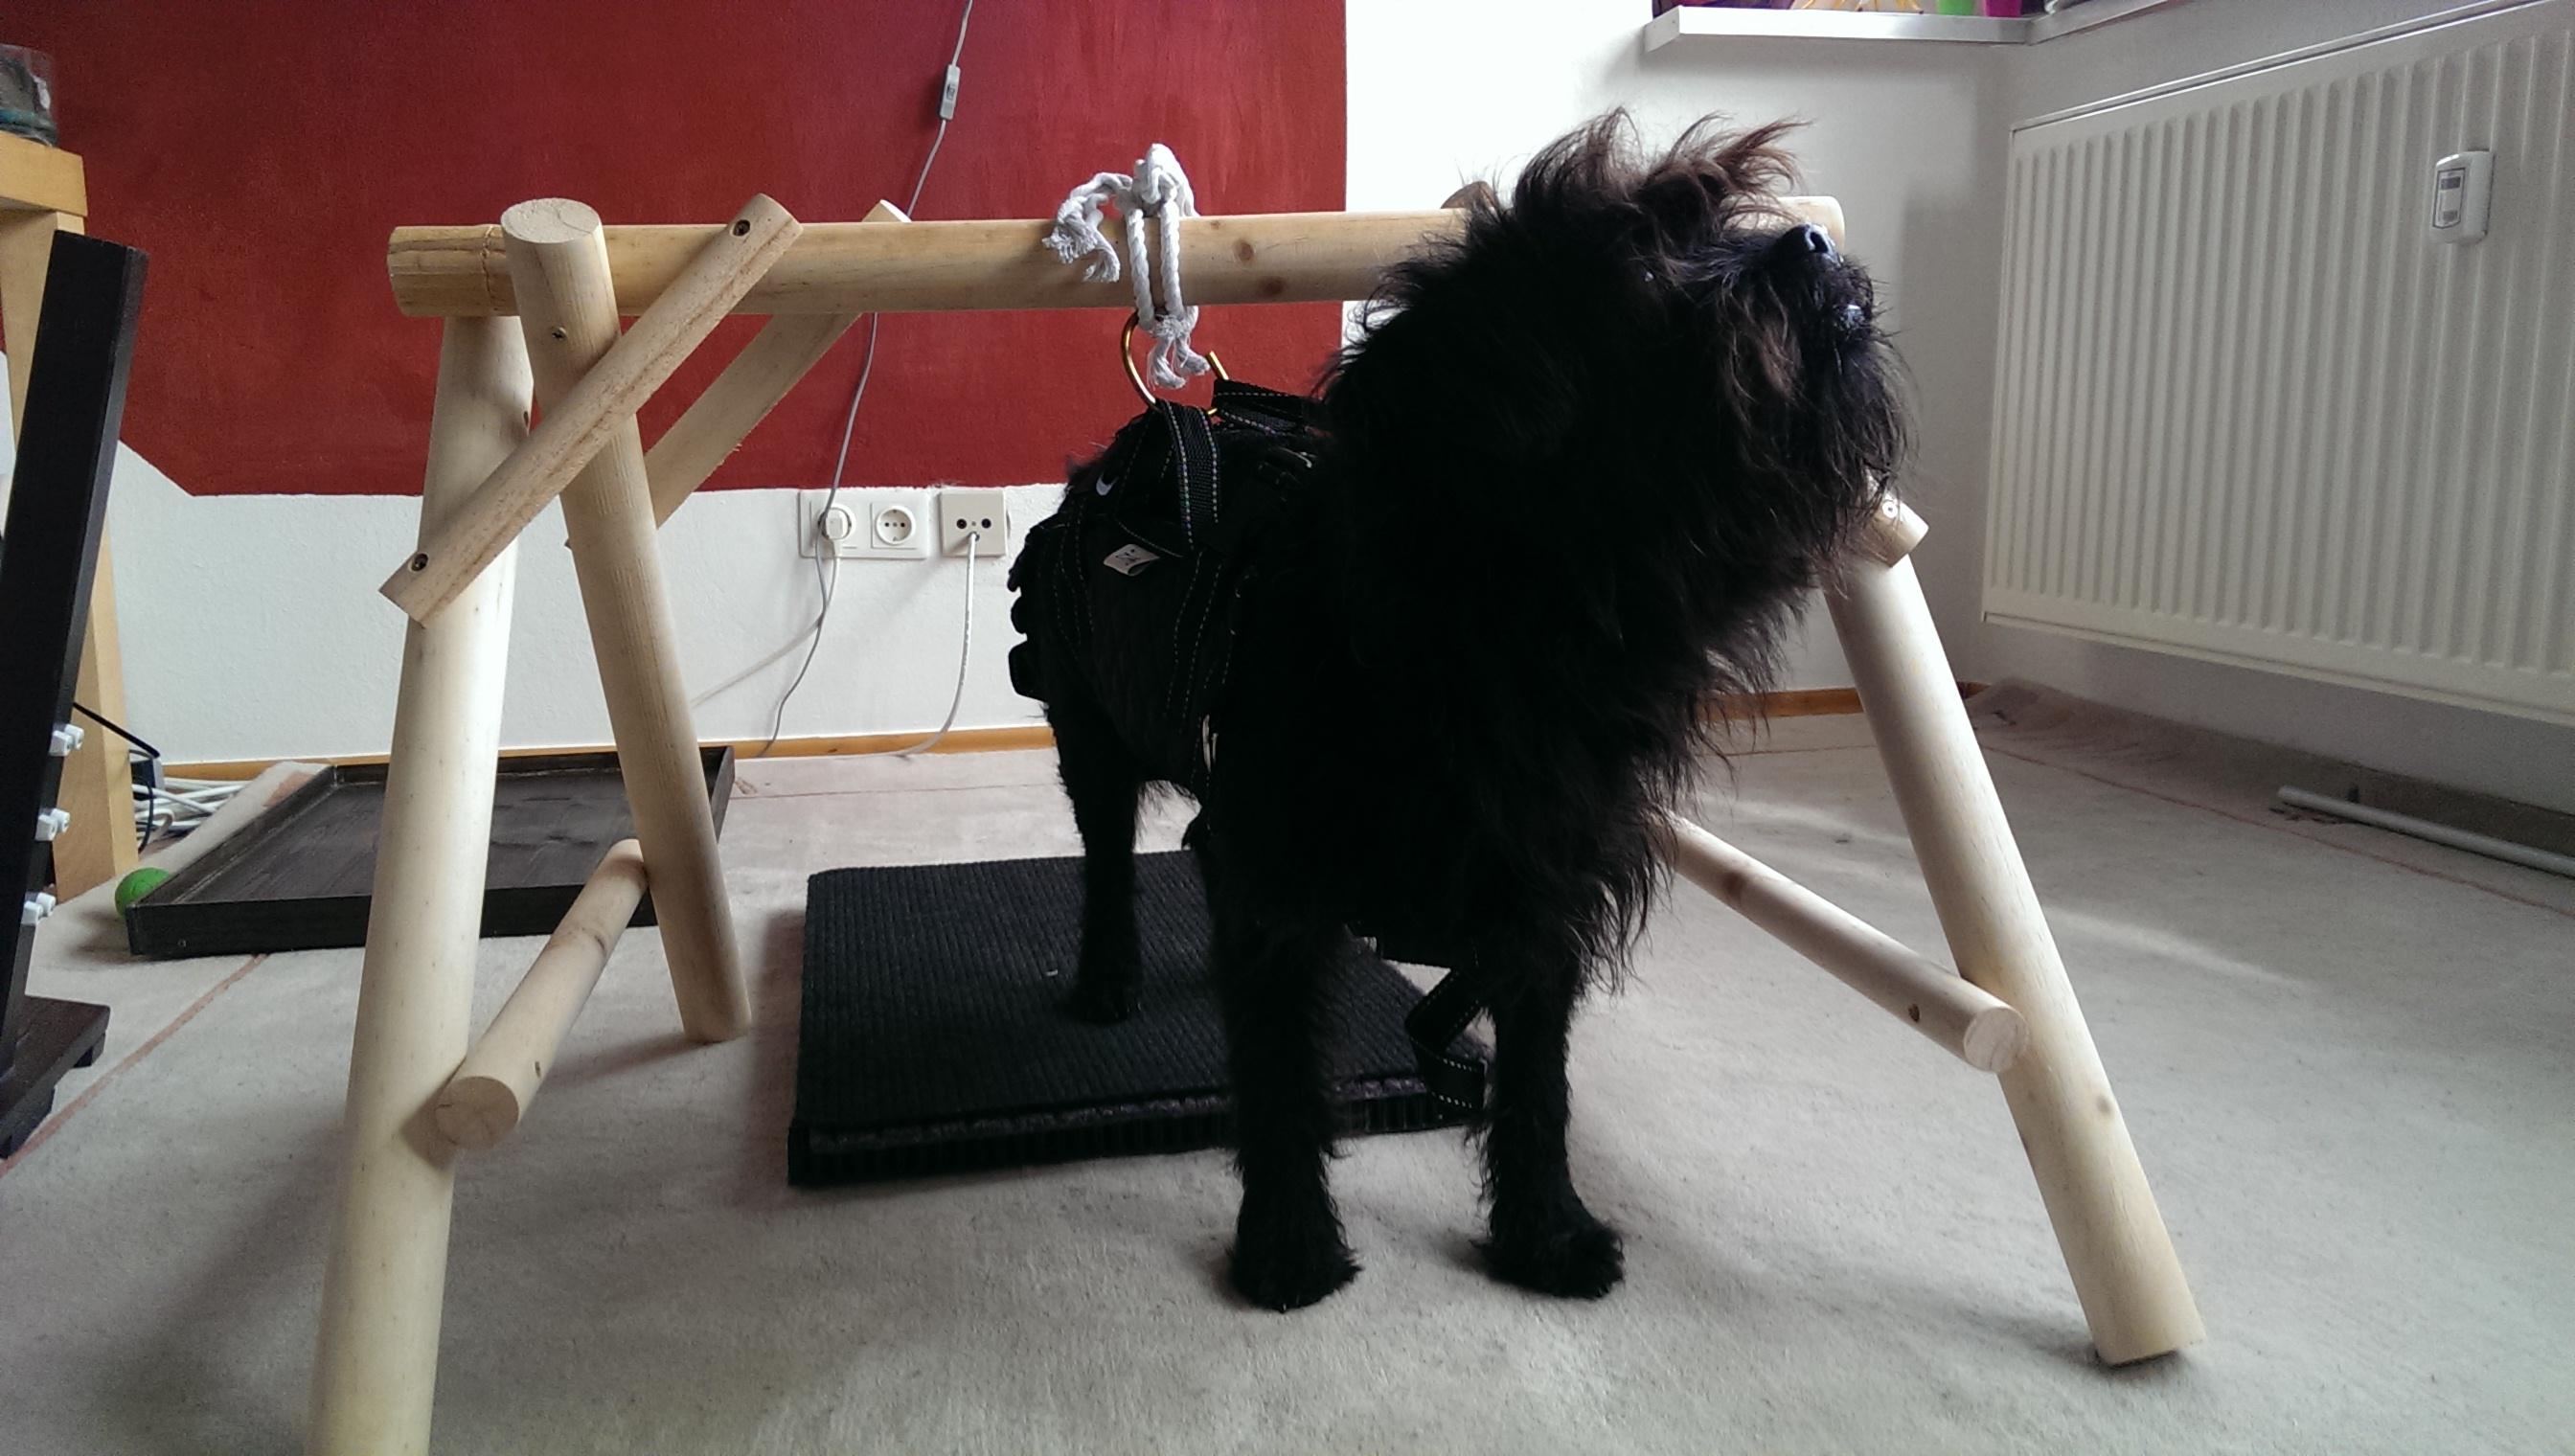 Neurologische BehandlungLähmung eines Hundes